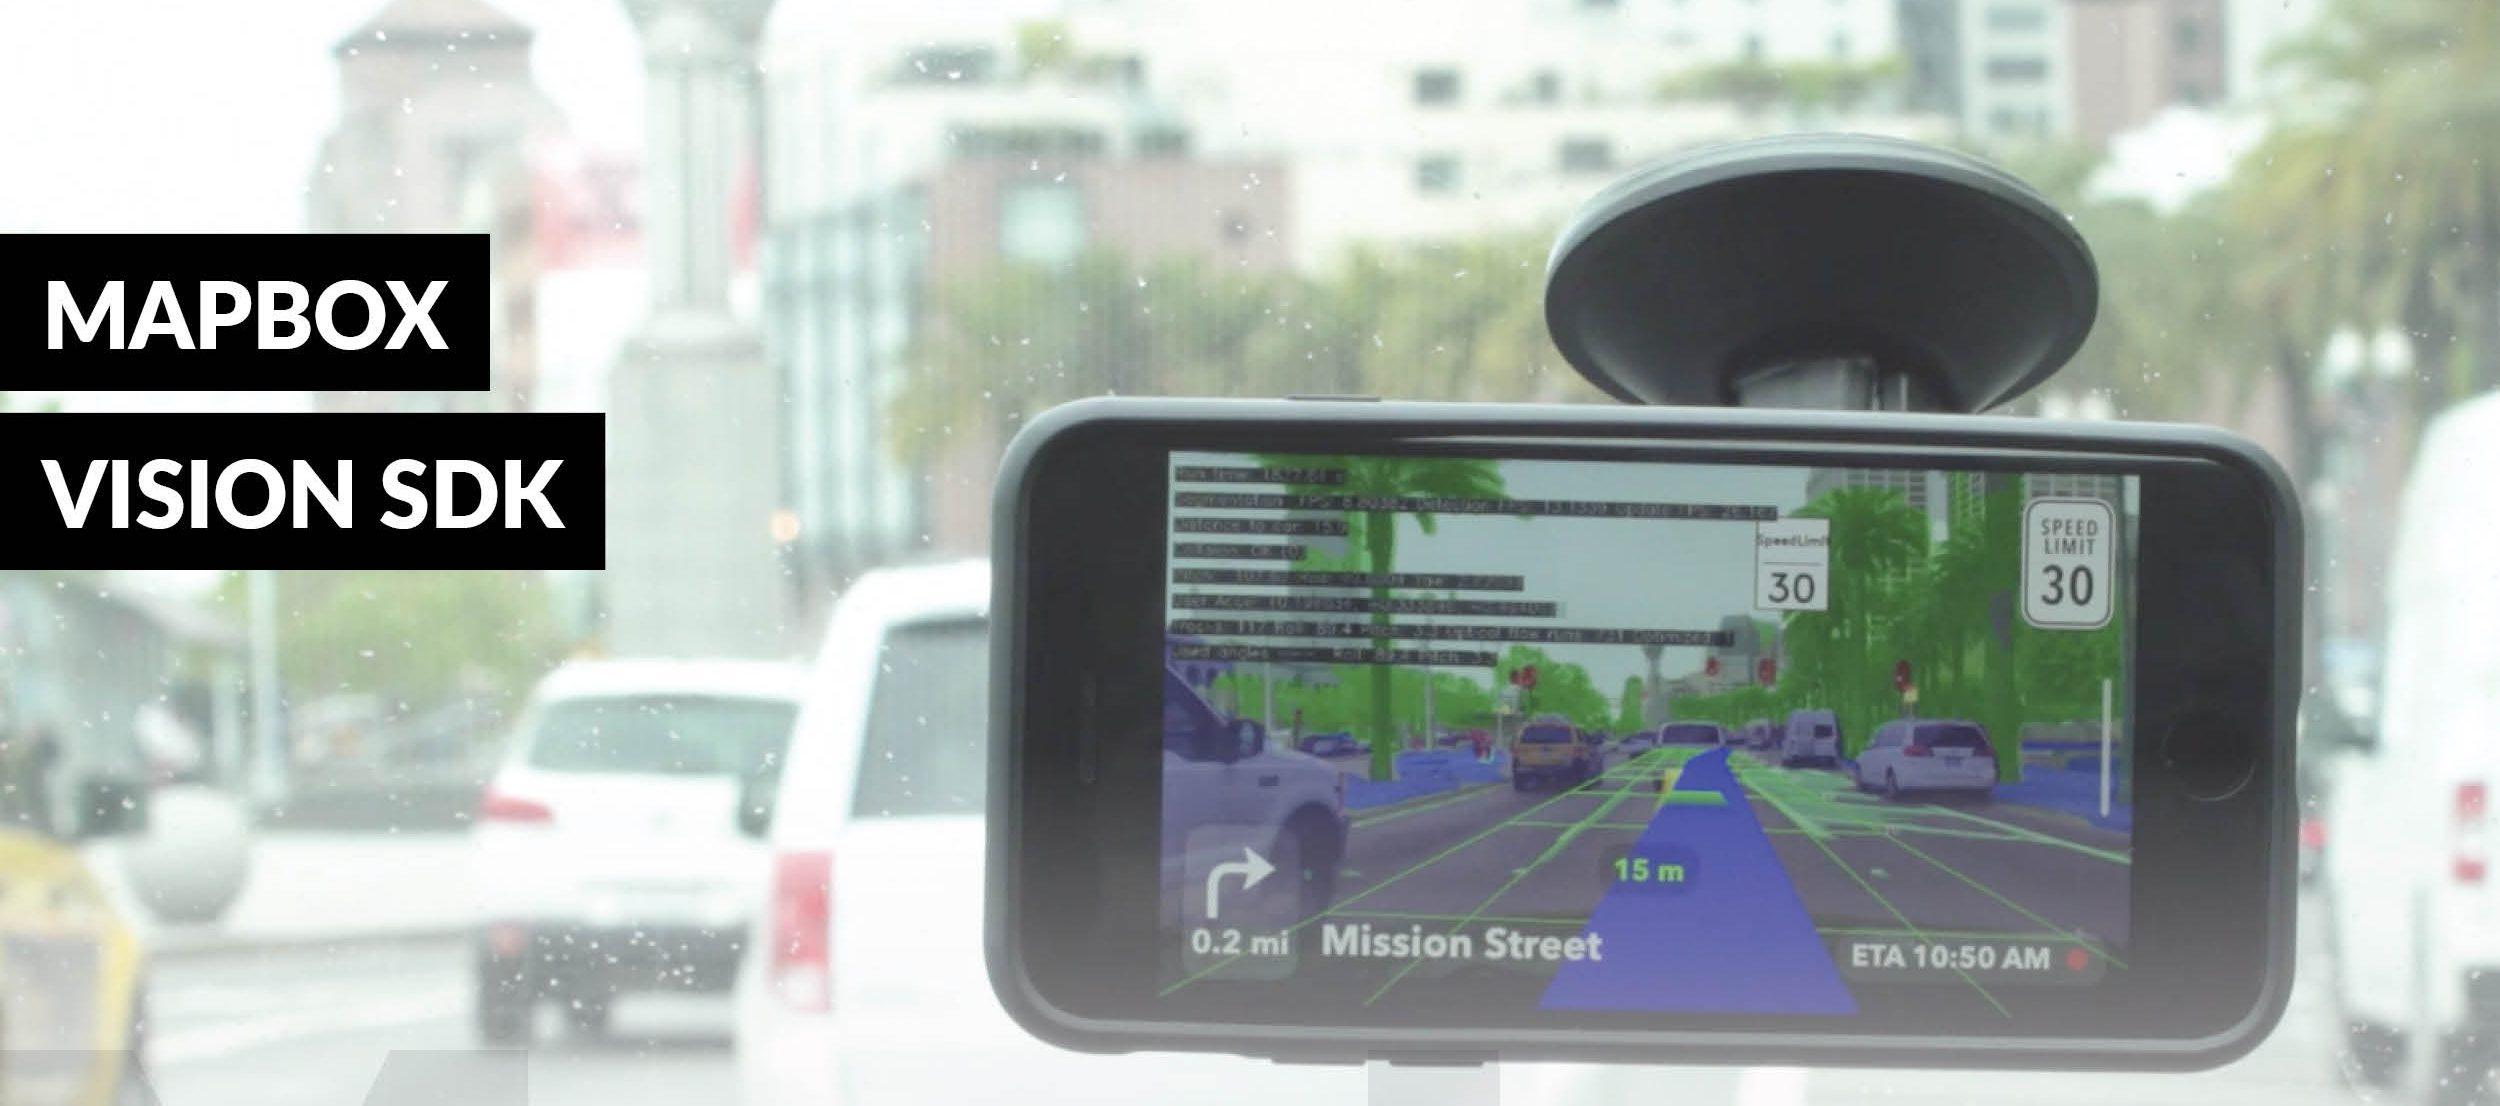 Mapbox announces Vision SDK for AR navigation